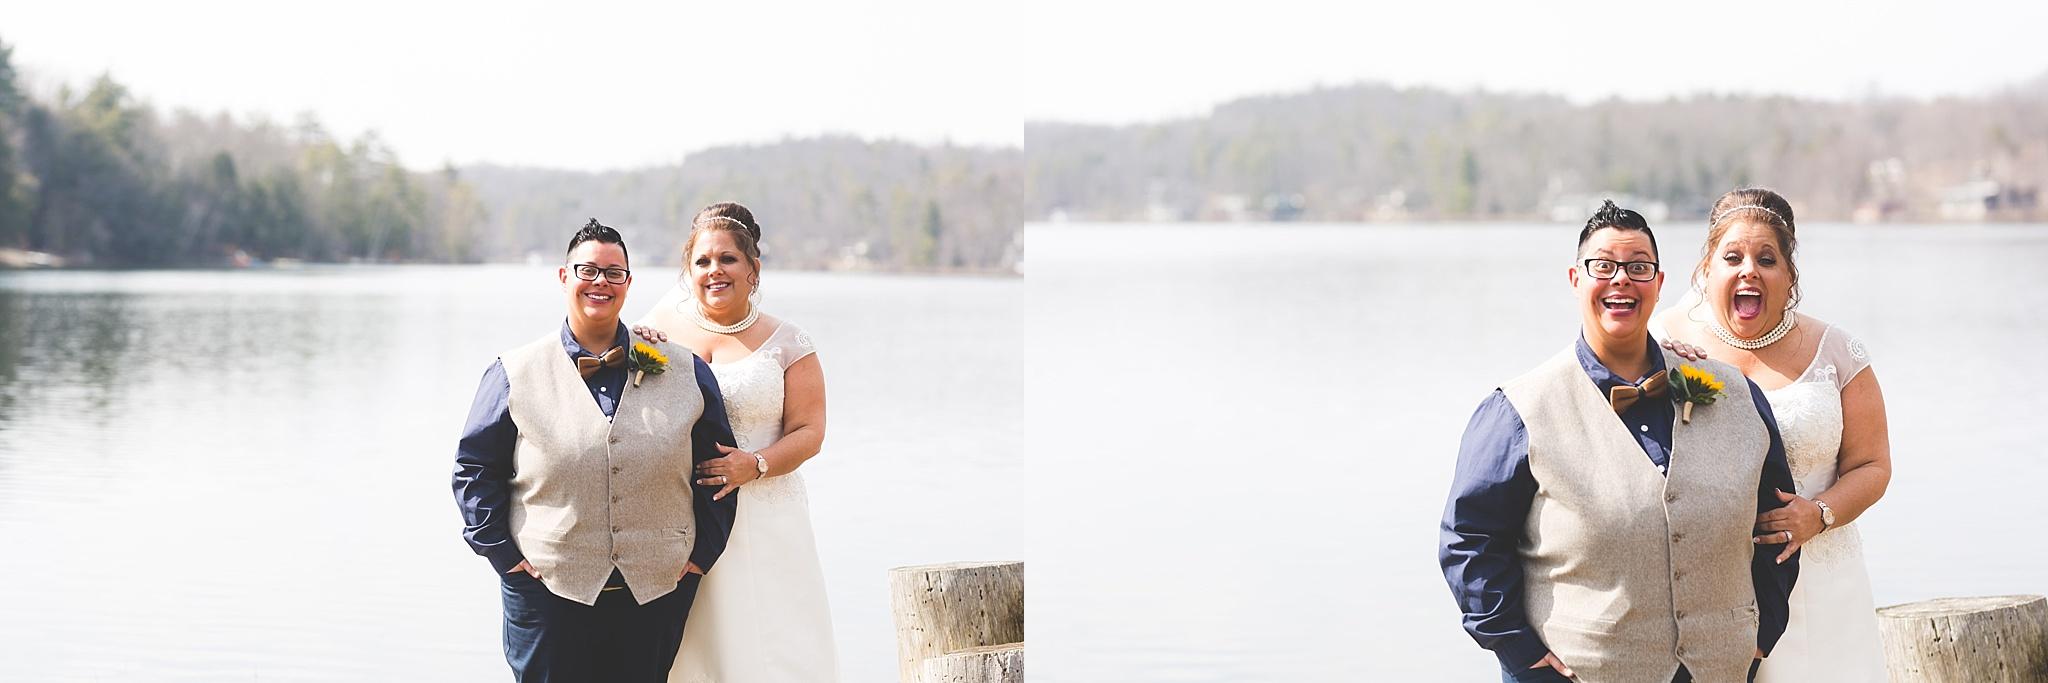 Albany_Wedding_Photographer_1652.jpg